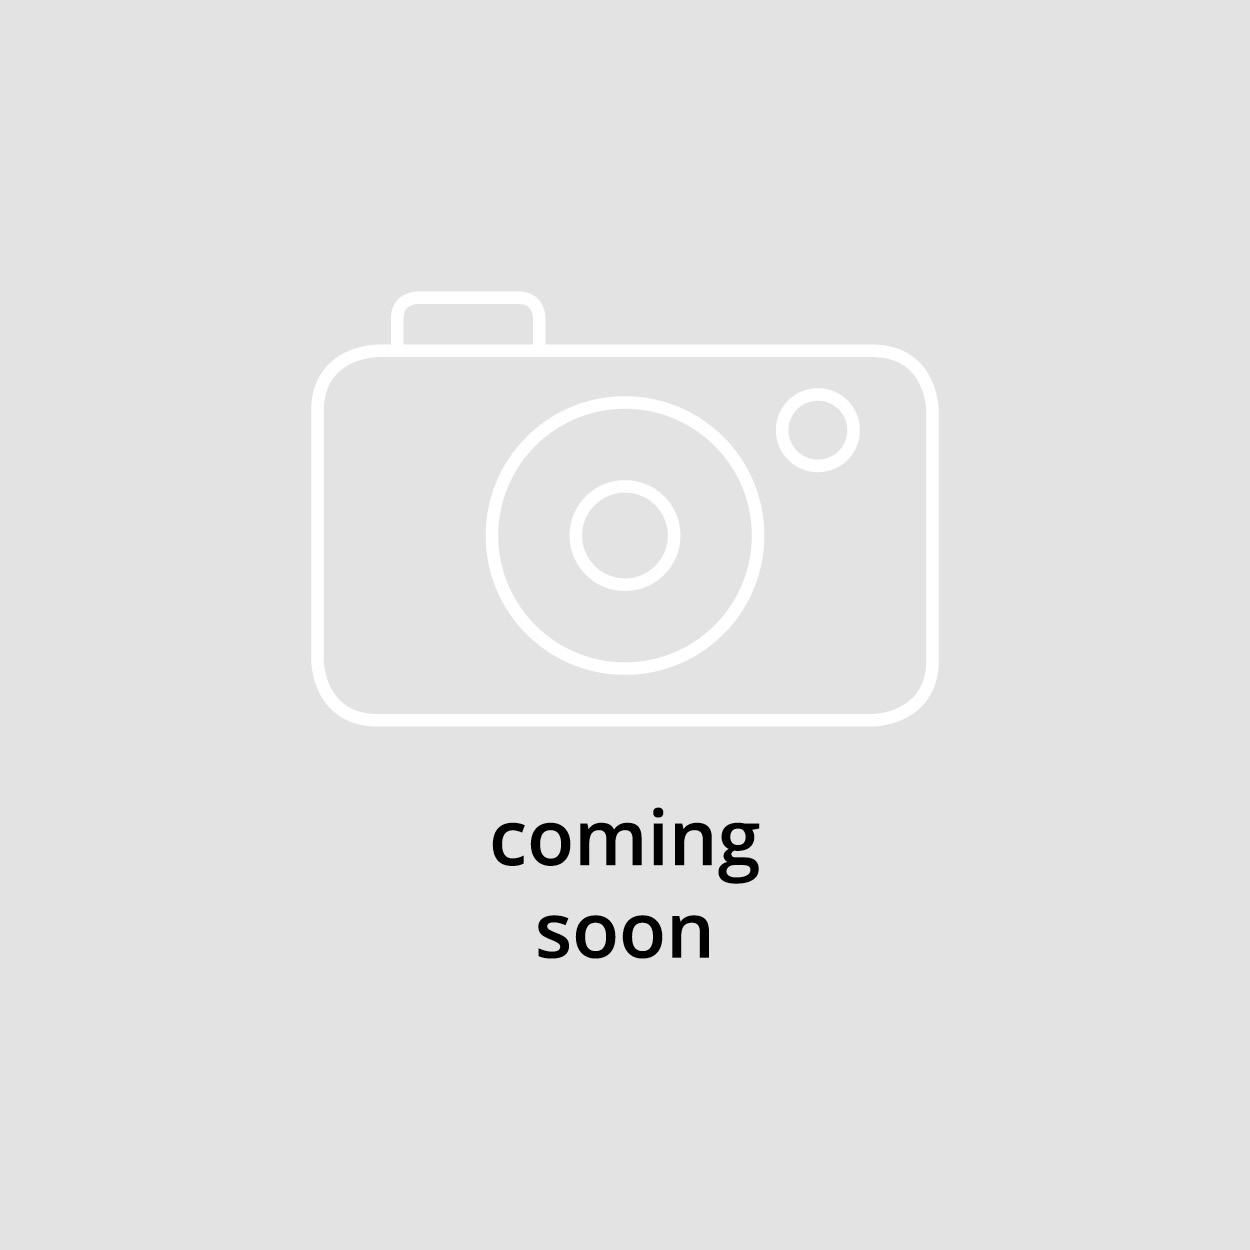 15.18.001 Mandrino per mandrini frontali Gildemeister AS20, GS20, GM20, GM20AC